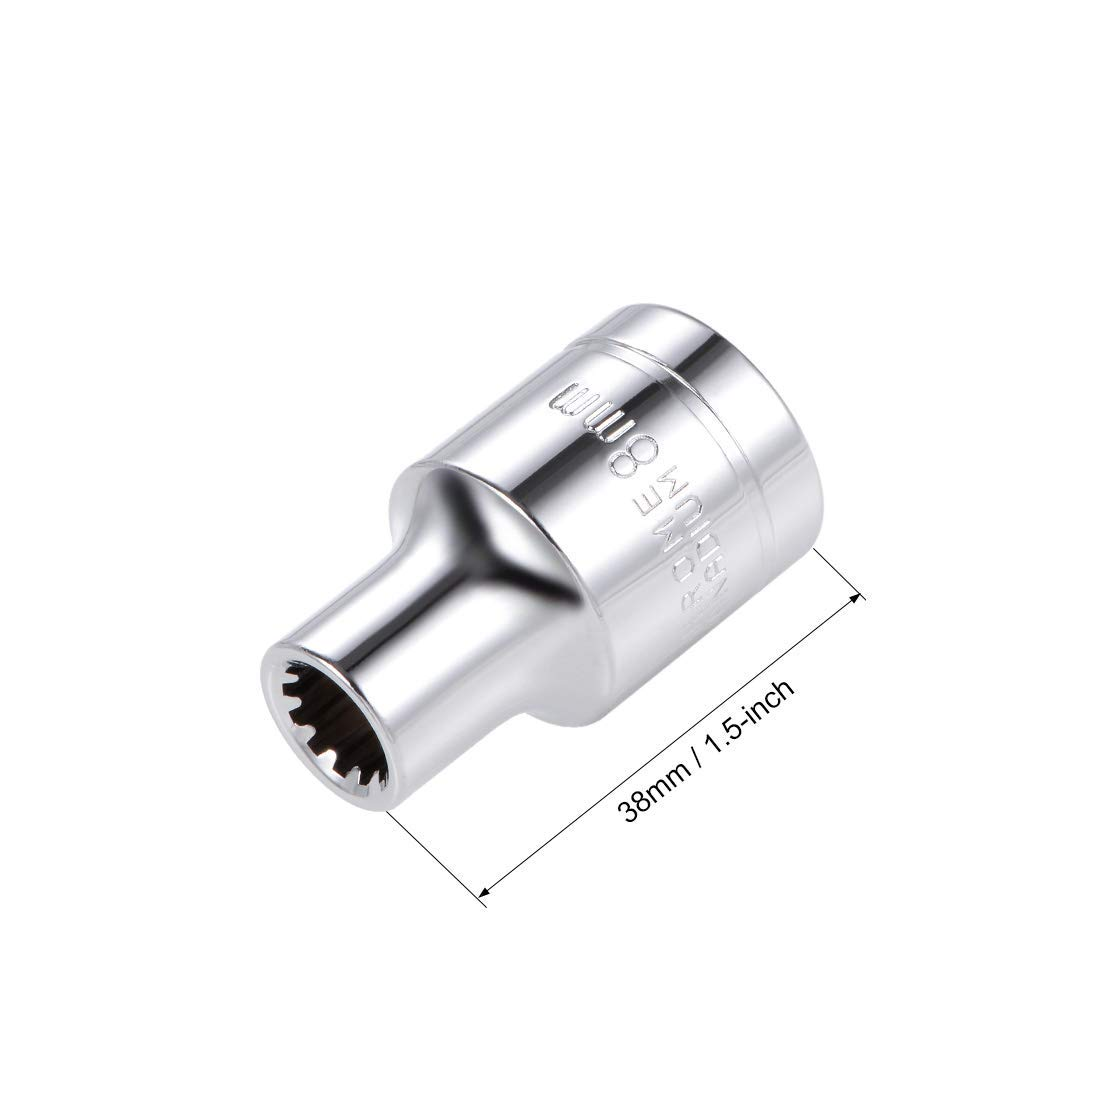 1//2-inch Drive E8 Universal Spline Socket Shallow 12 Point Cr-V Steel 2 Pcs